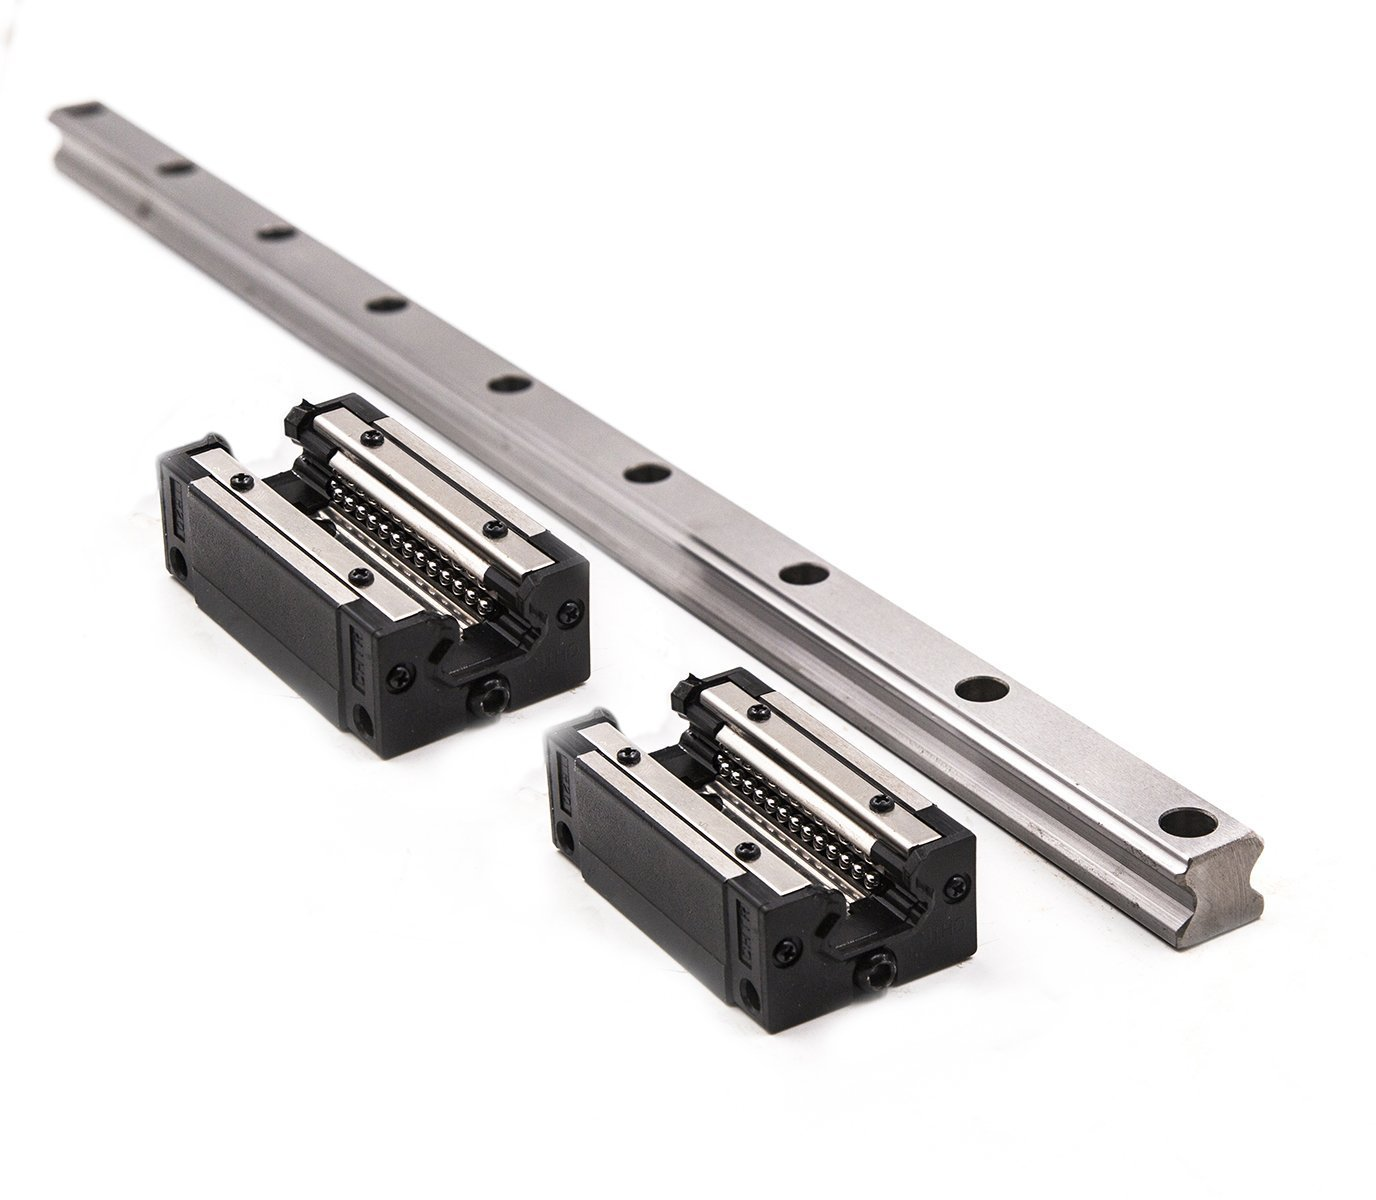 TEN-HIGH CNC parts linear rail HSR15 600mm Approx 23.62inch Linear Guideway Rail+2pcs HSR15CR Square type carriage bearing block